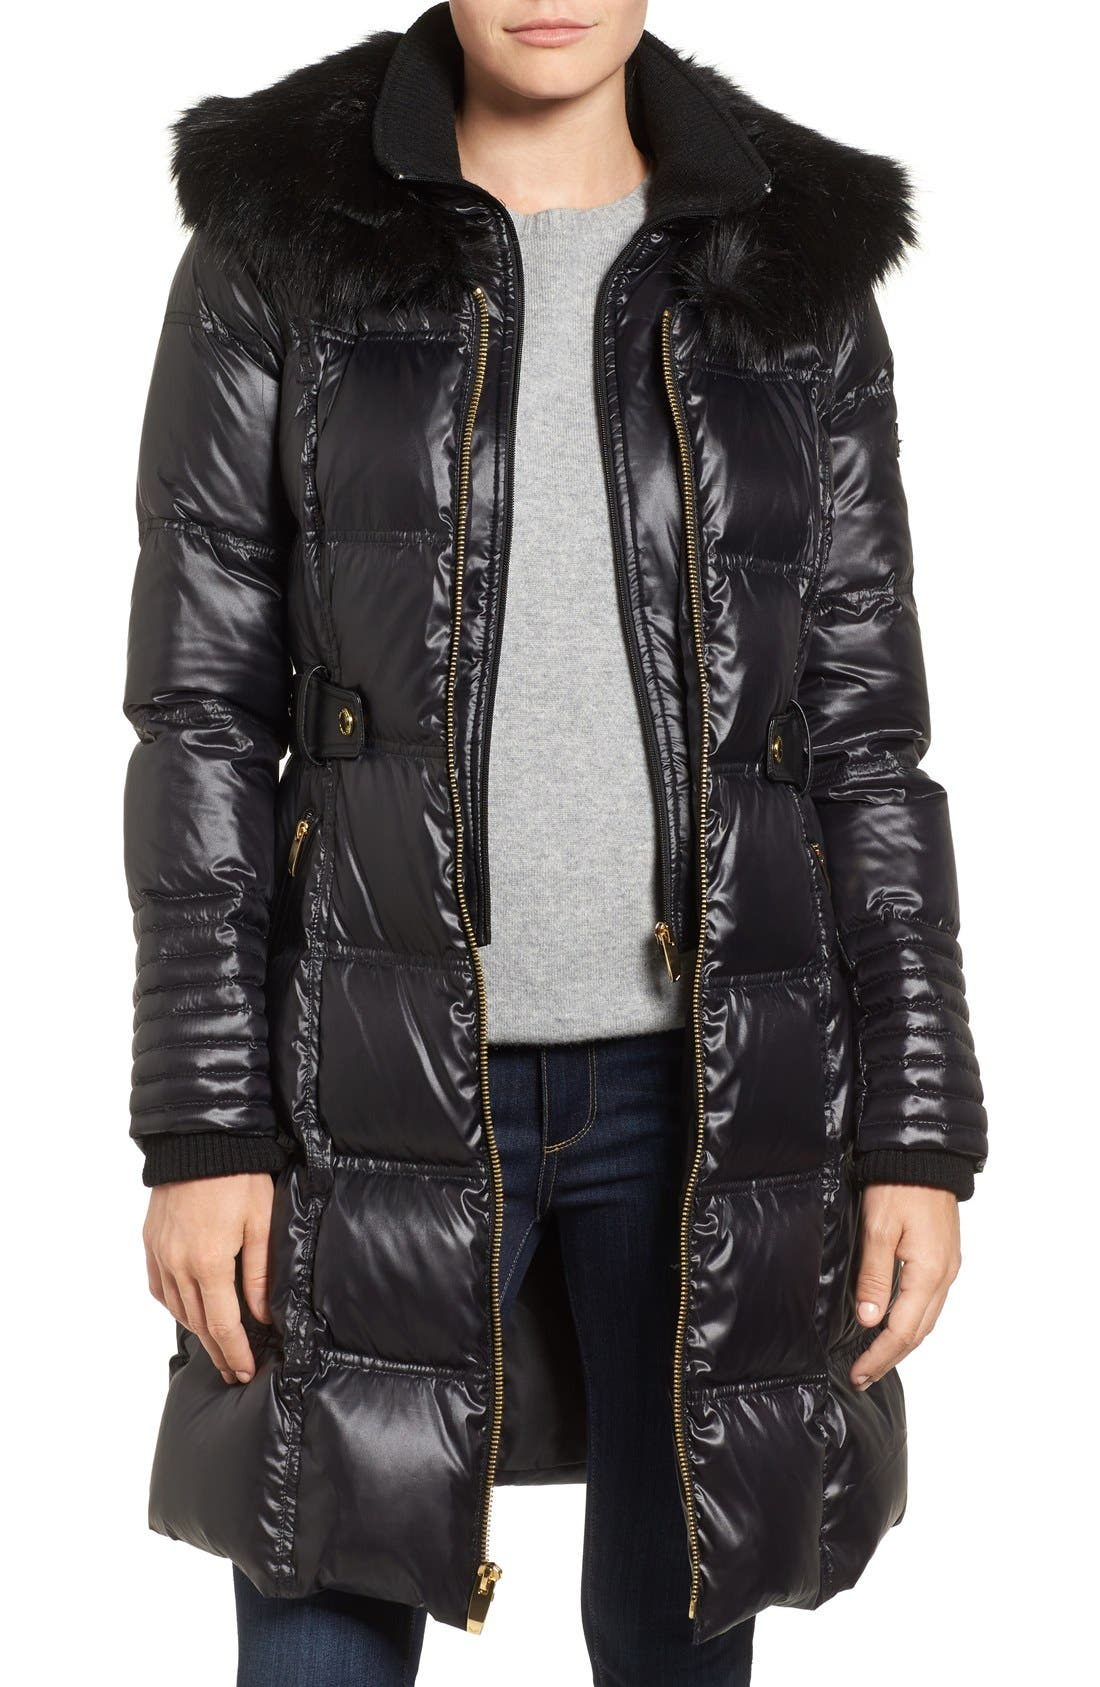 Main Image - Via Spiga Quilted Coat with Faux Fur Trim